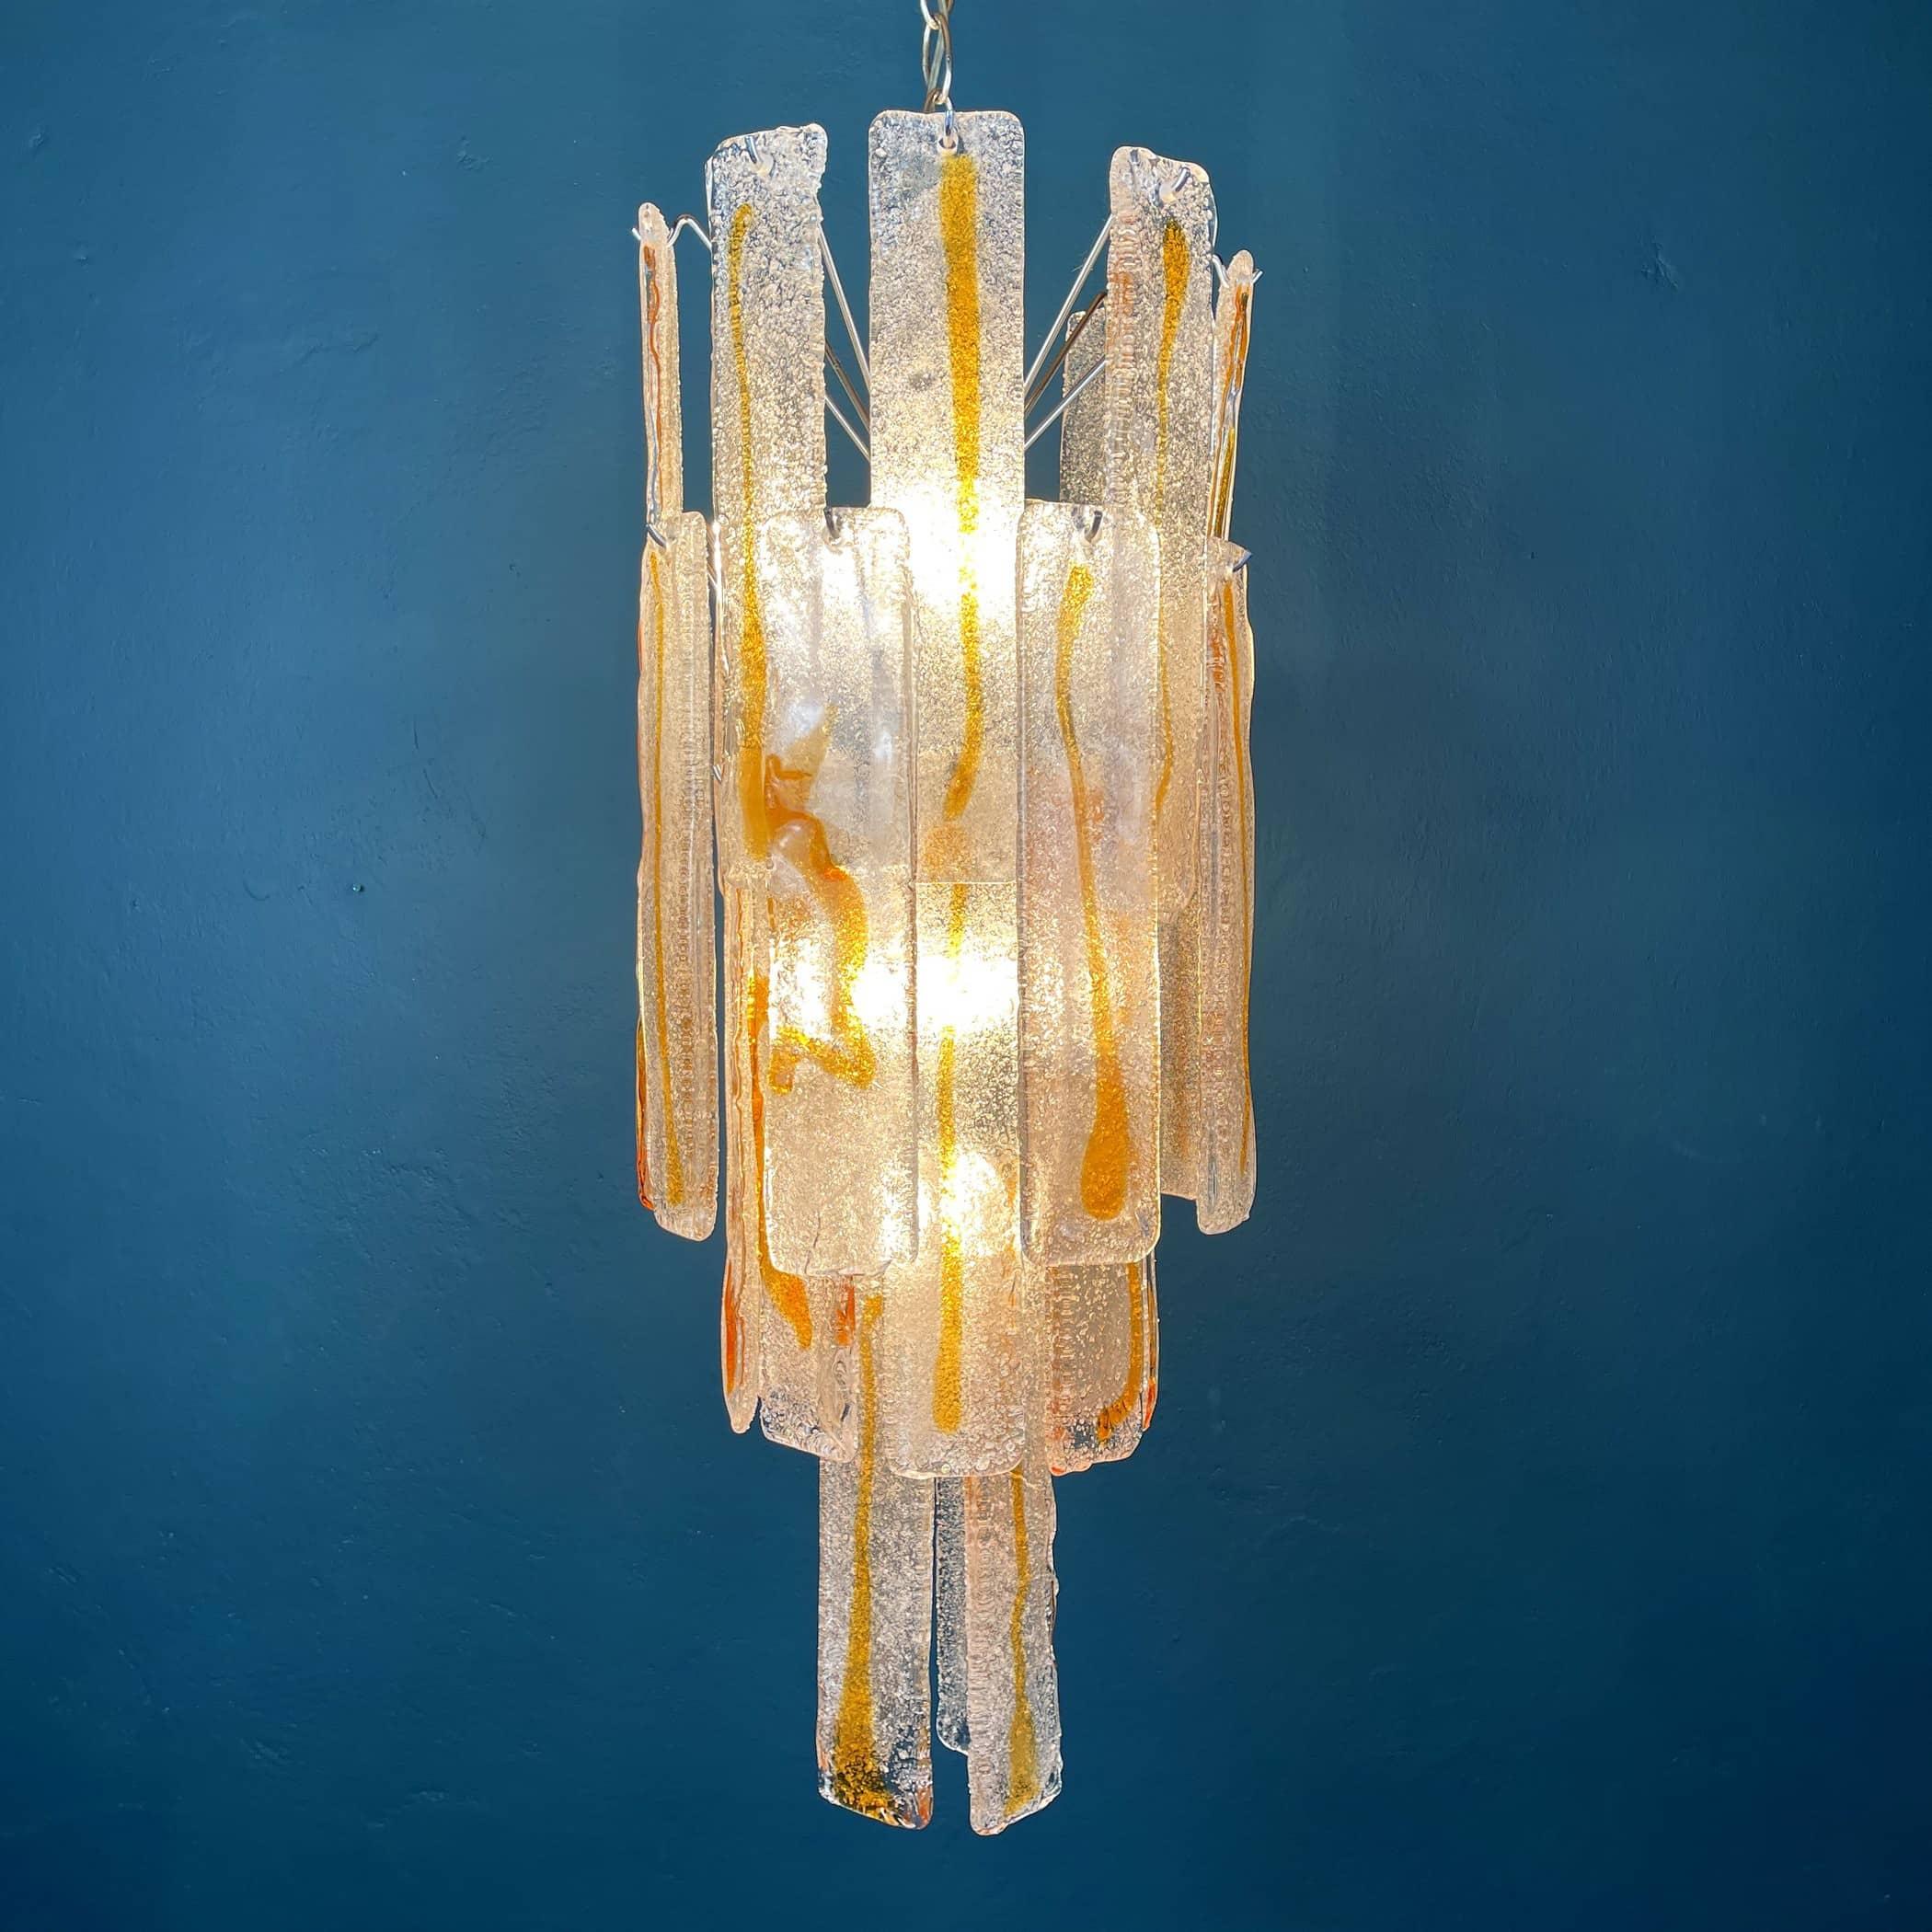 Mid-century large Murano glass chandelier Mazzega Italy 1970s Vintage italian lighting Space age 28 murano plates